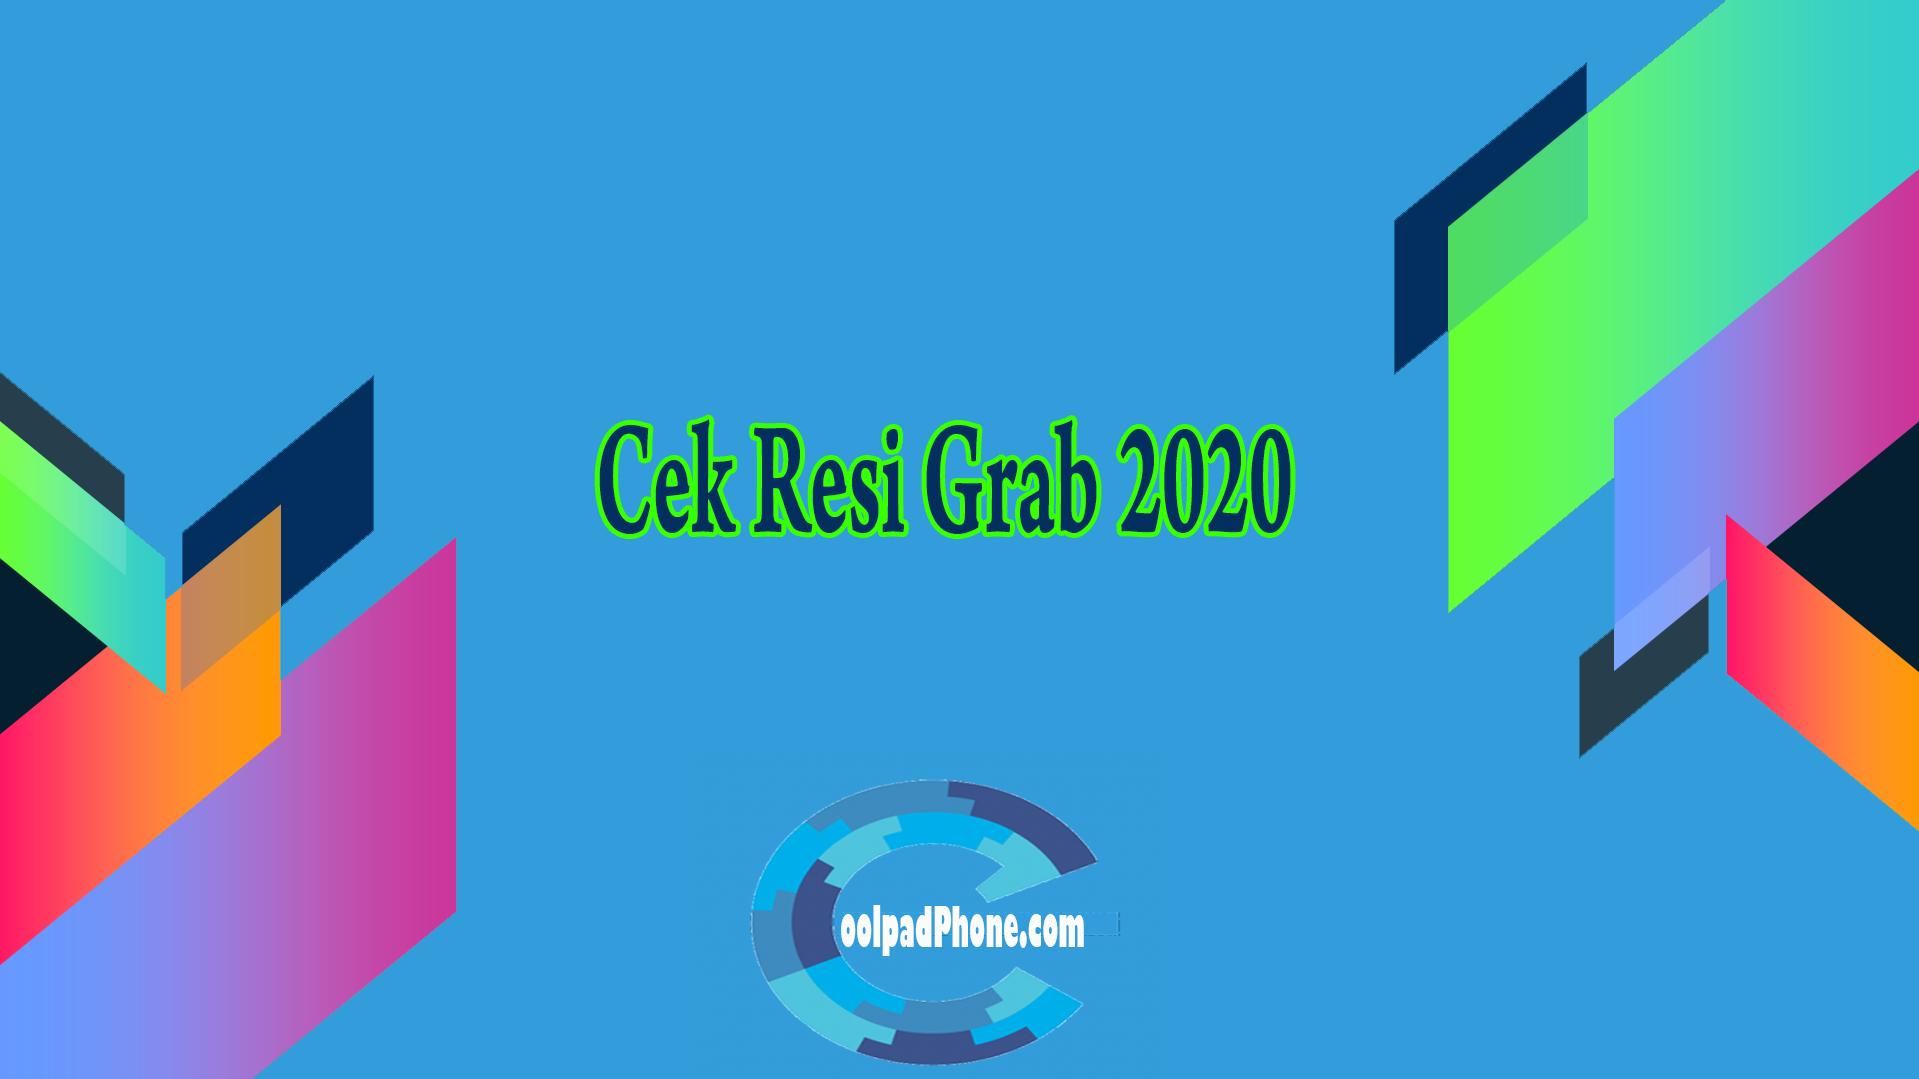 Cek Resi Grab 2020